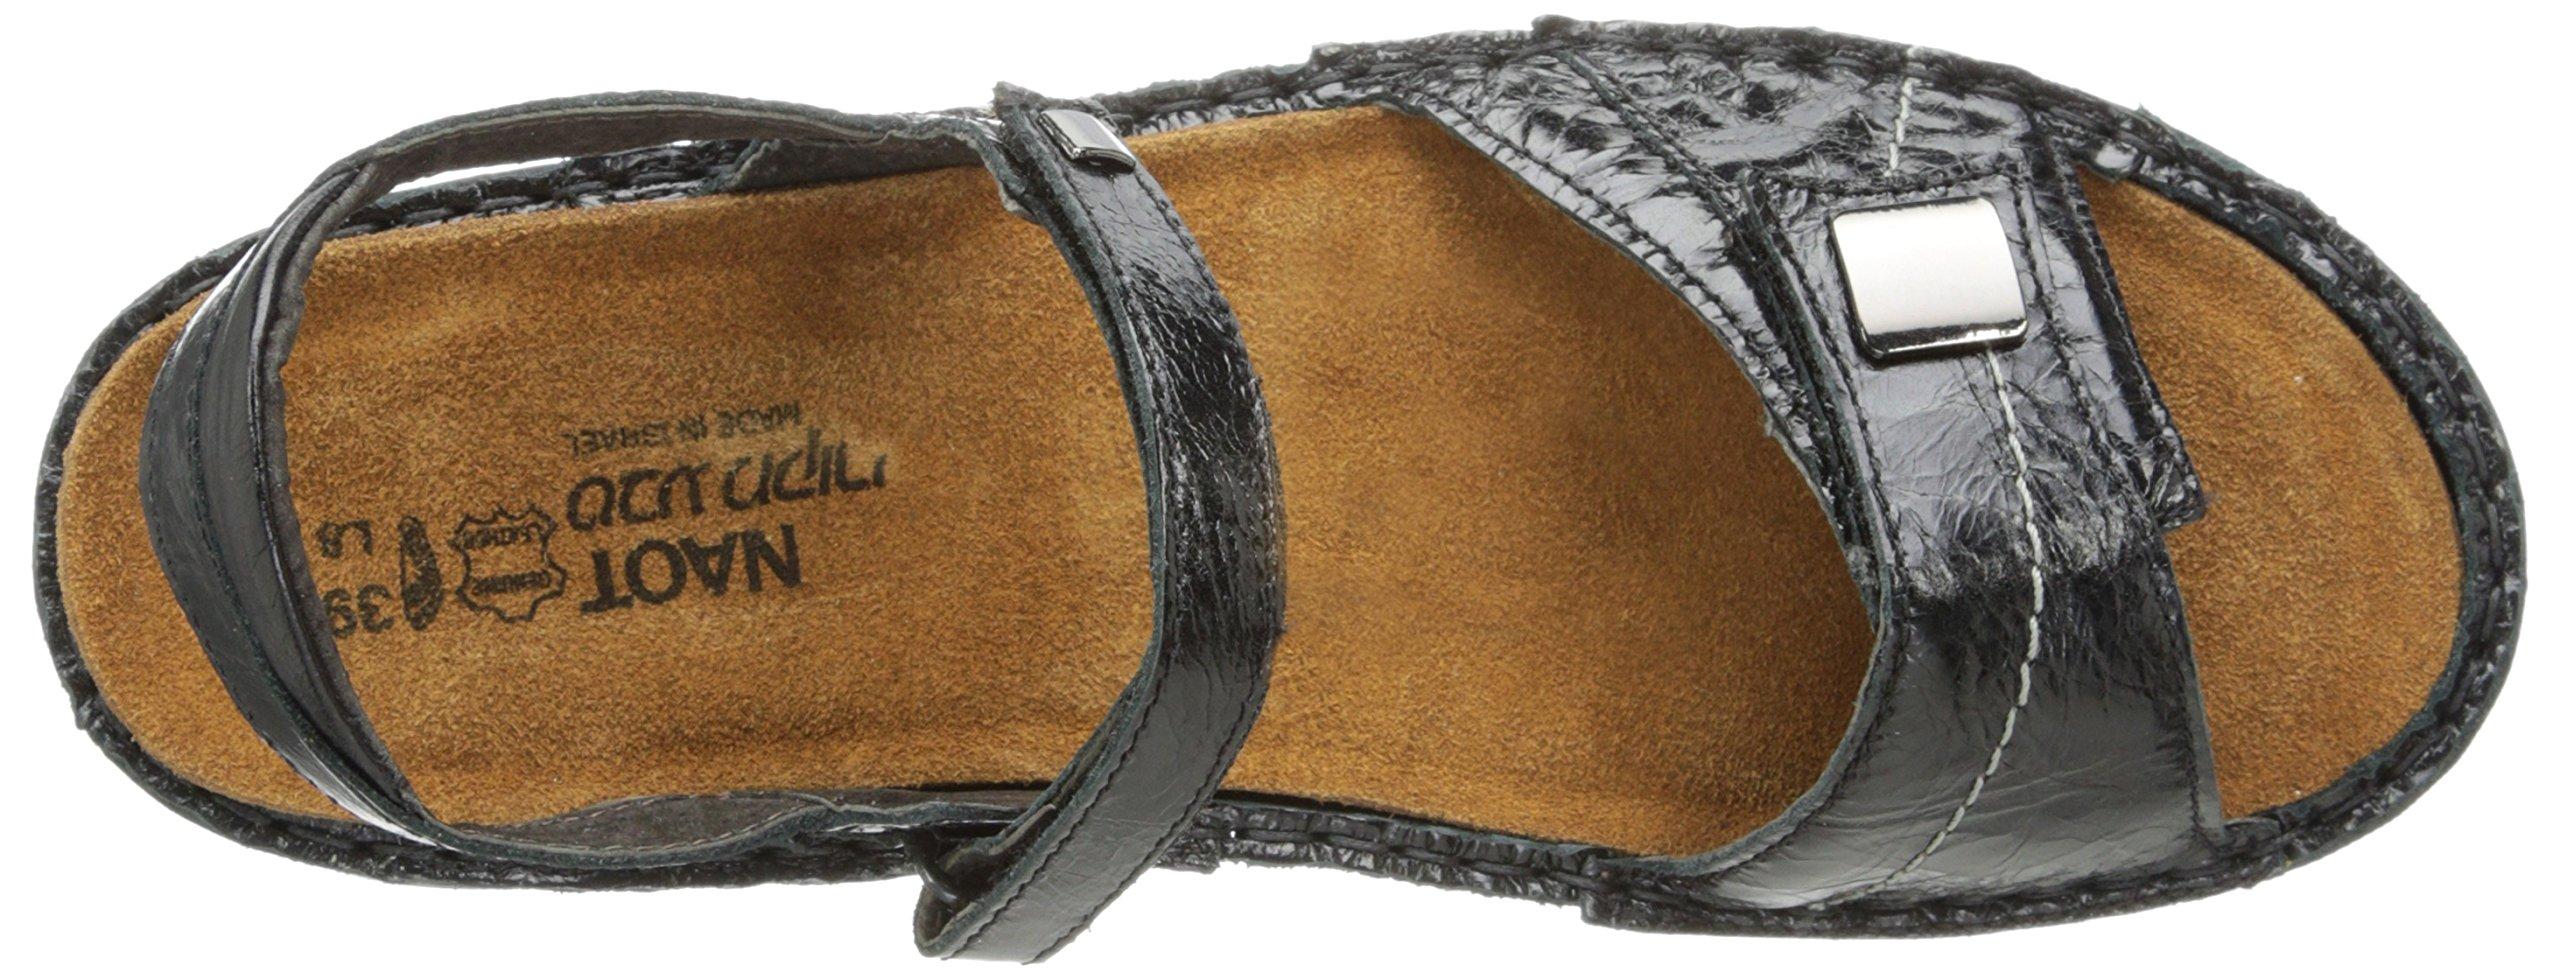 Naot Women's Papaya Flat,Black Madras Leather,40 EU/8.5-9 M US by NAOT (Image #8)